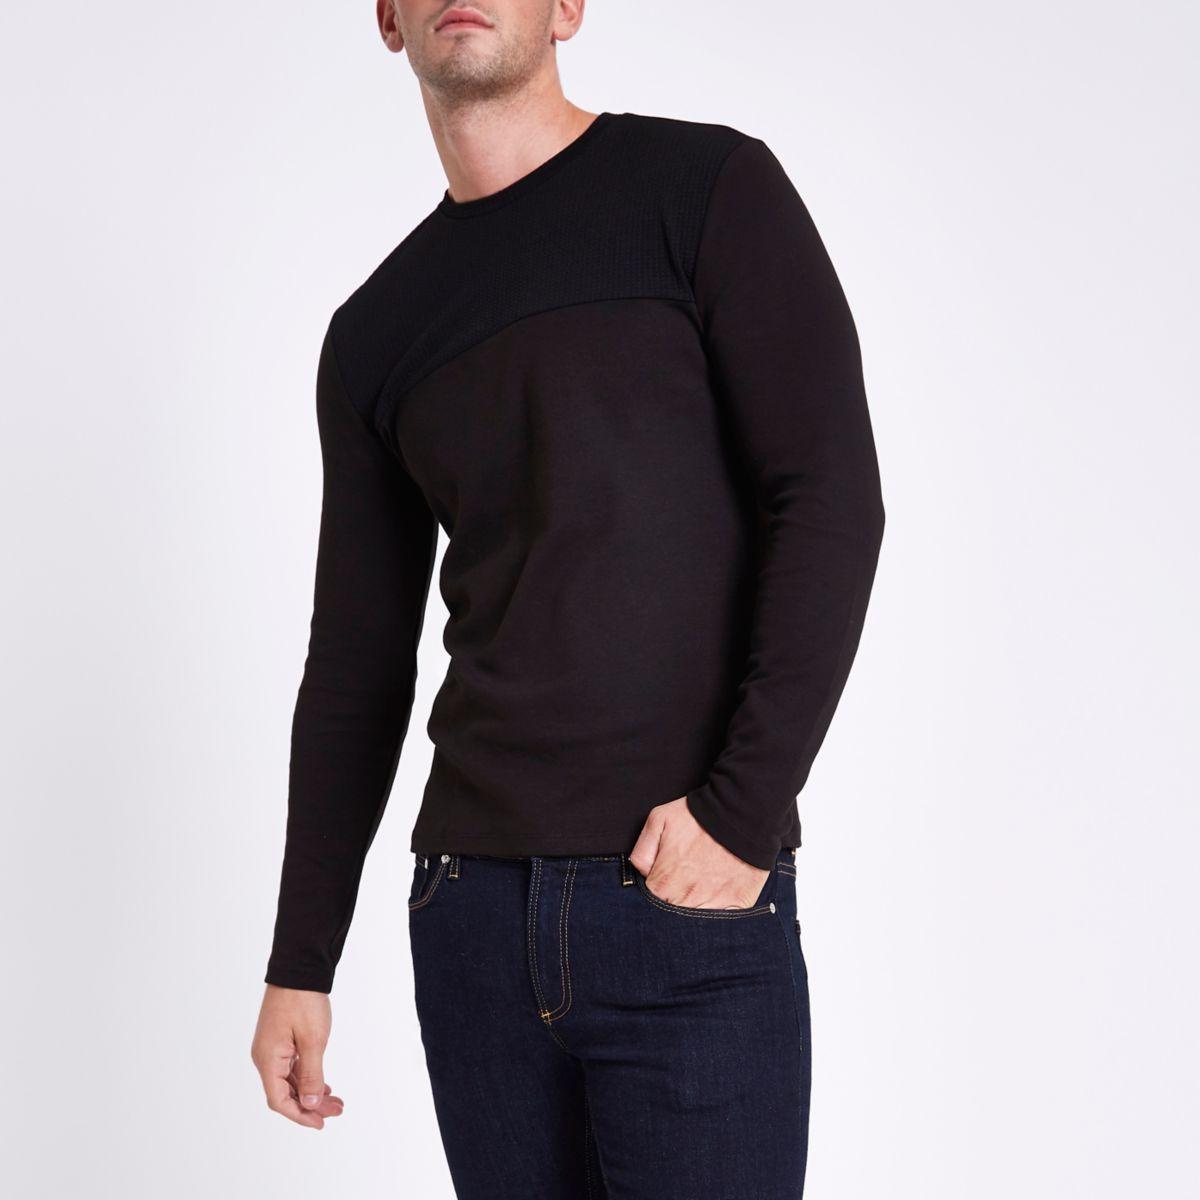 Black slim fit textured crew neck sweater